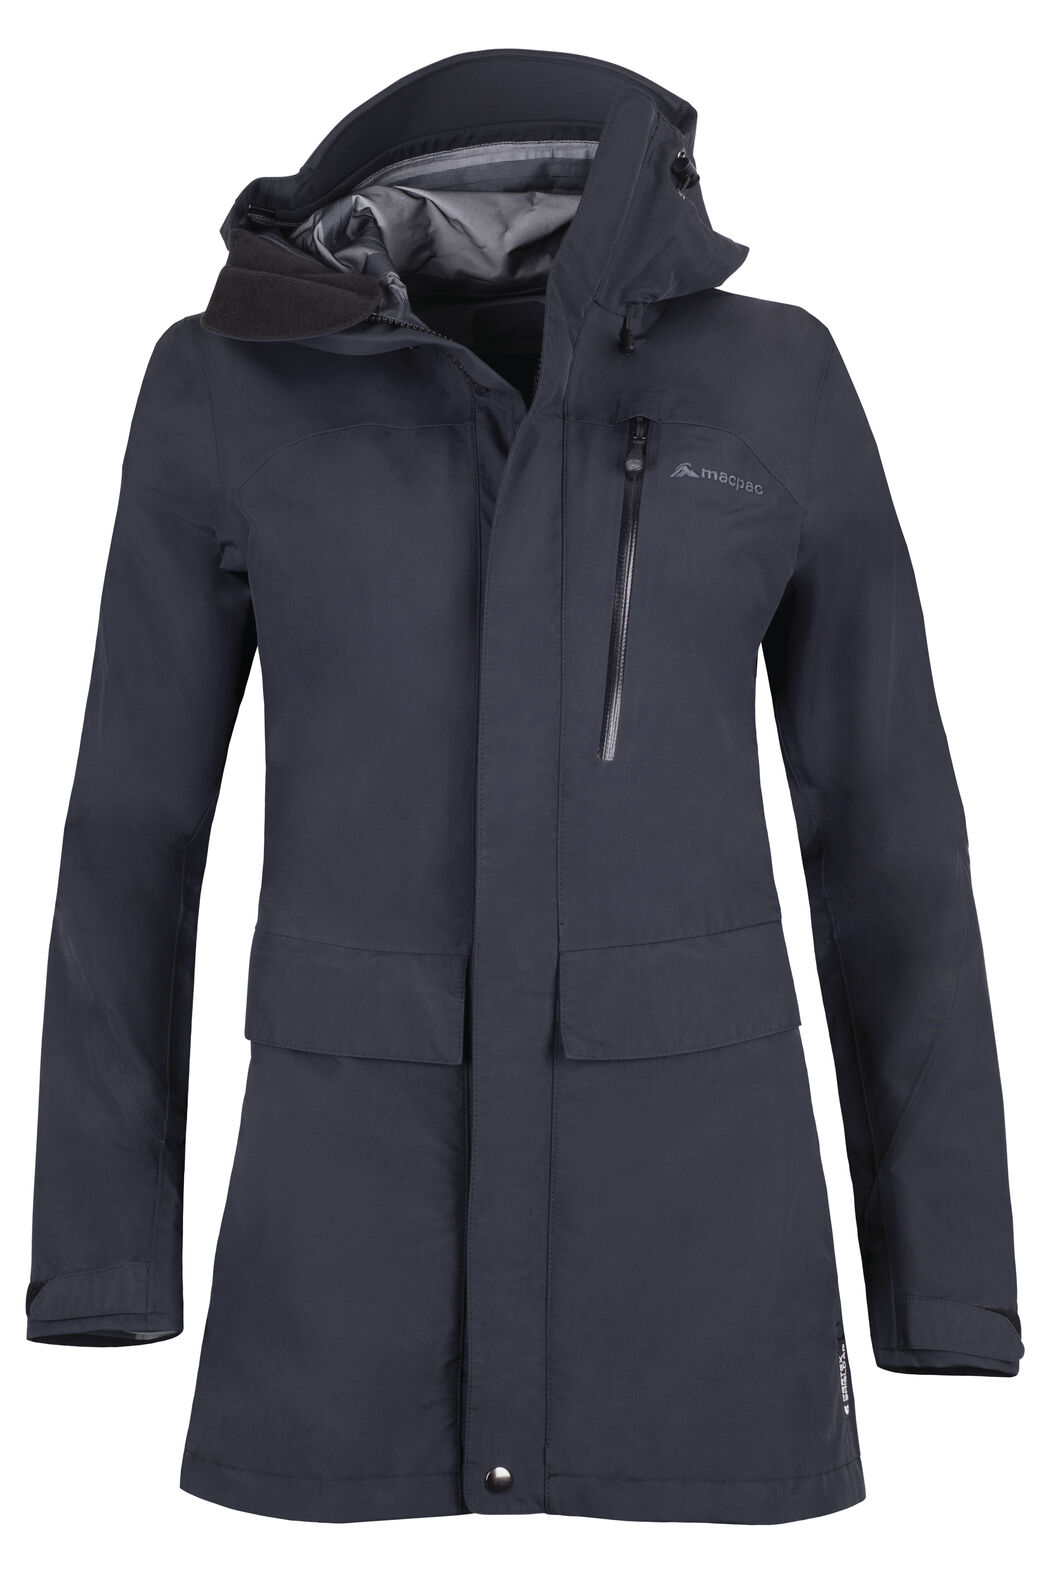 Macpac Resolution Pertex® Long Rain Jacket - Women's, Black, hi-res